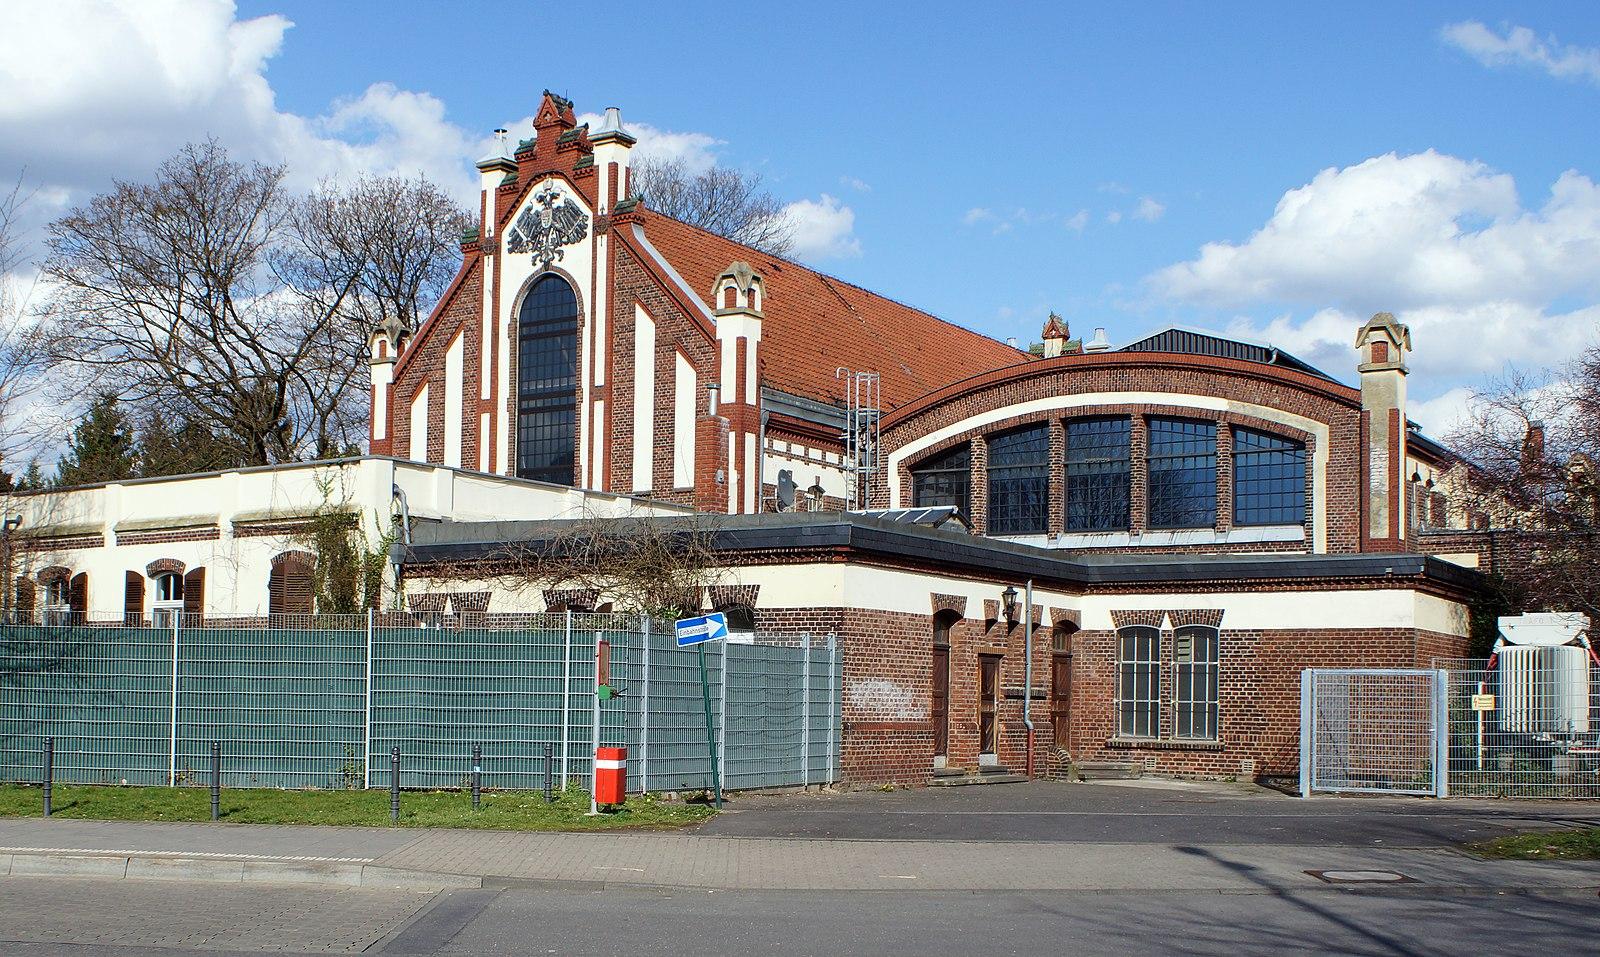 Datei:Köln-Ostheim, Umspannwerk 2013-04-13.JPG - Wikipedia